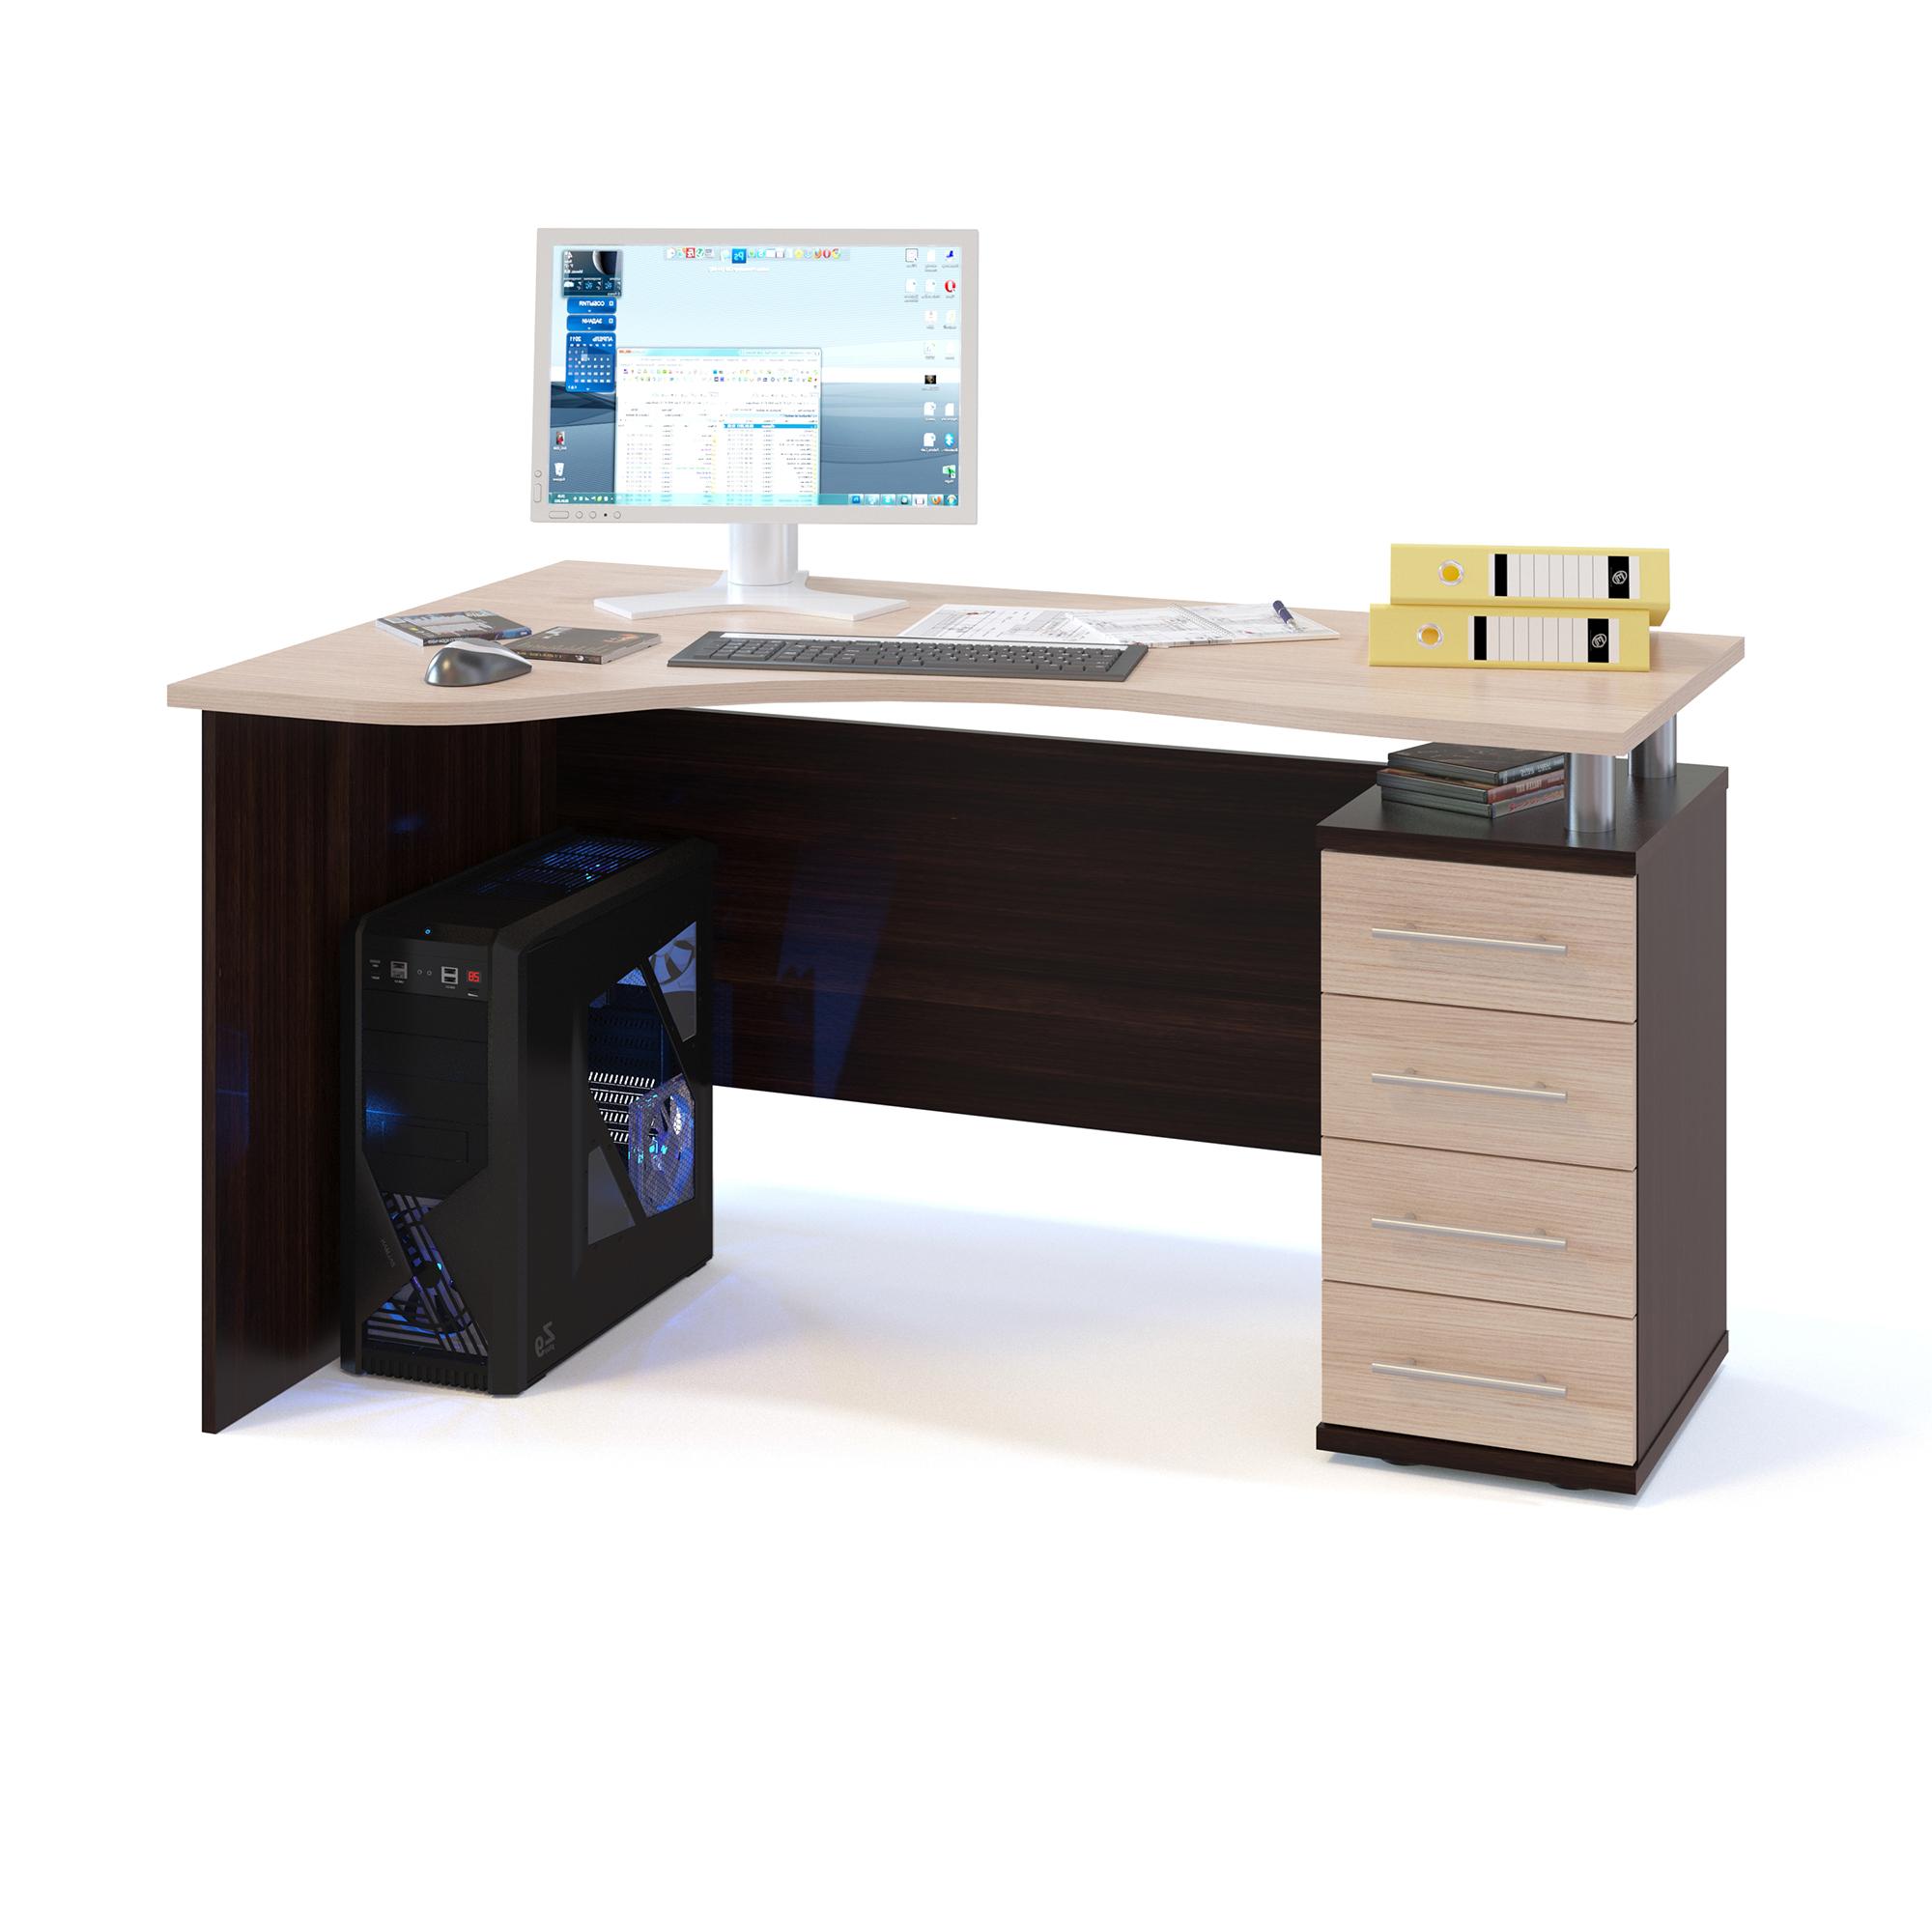 Компьютерный стол СОКОЛ КСТ-104.1П 140x86x75, дуб венге/белёный дуб